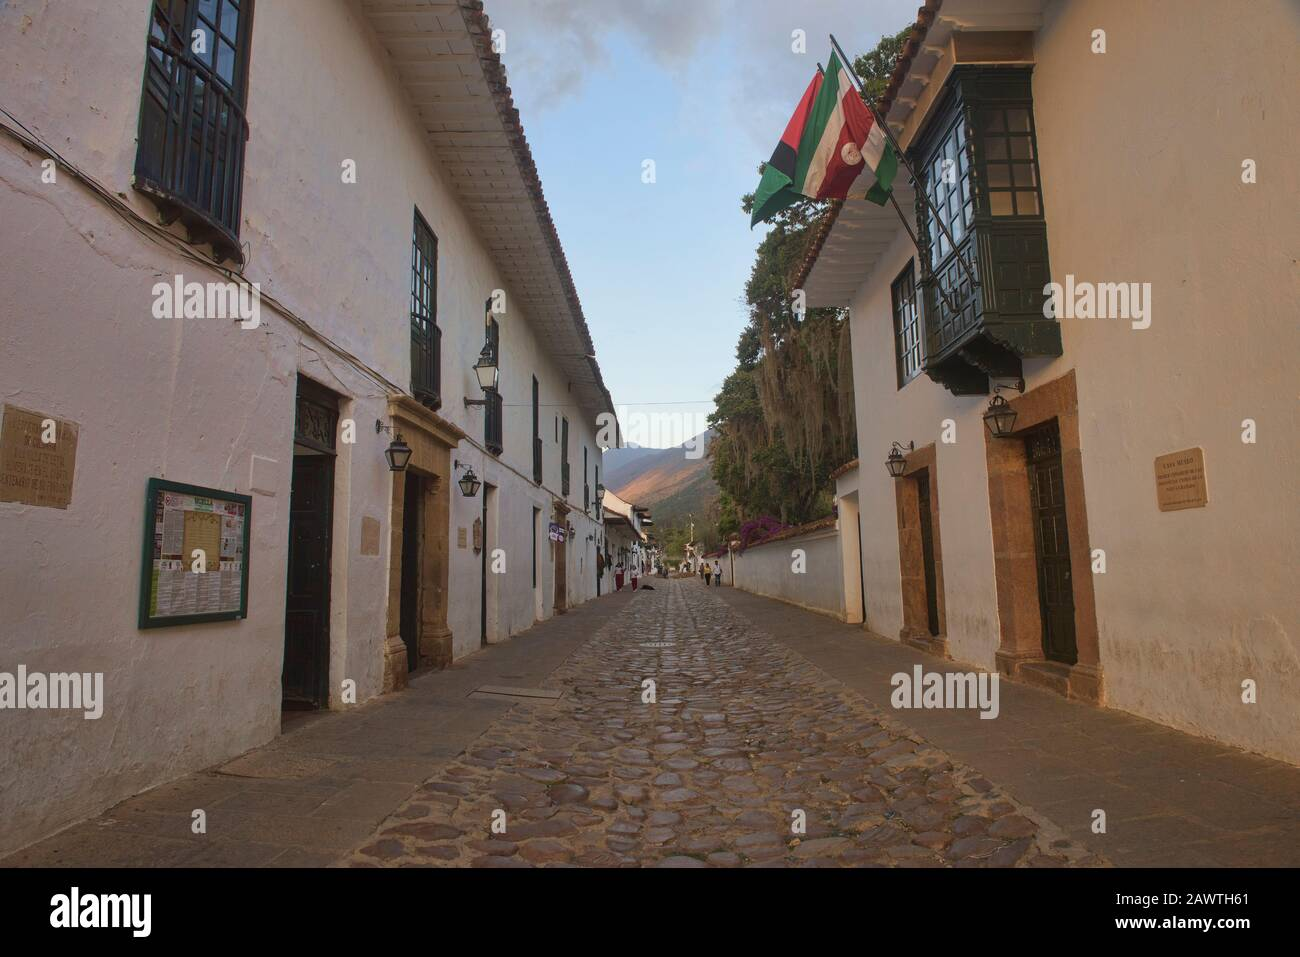 Rues pavées dans la charmante Villa coloniale de Leyva, Boyaca, Colombie Banque D'Images